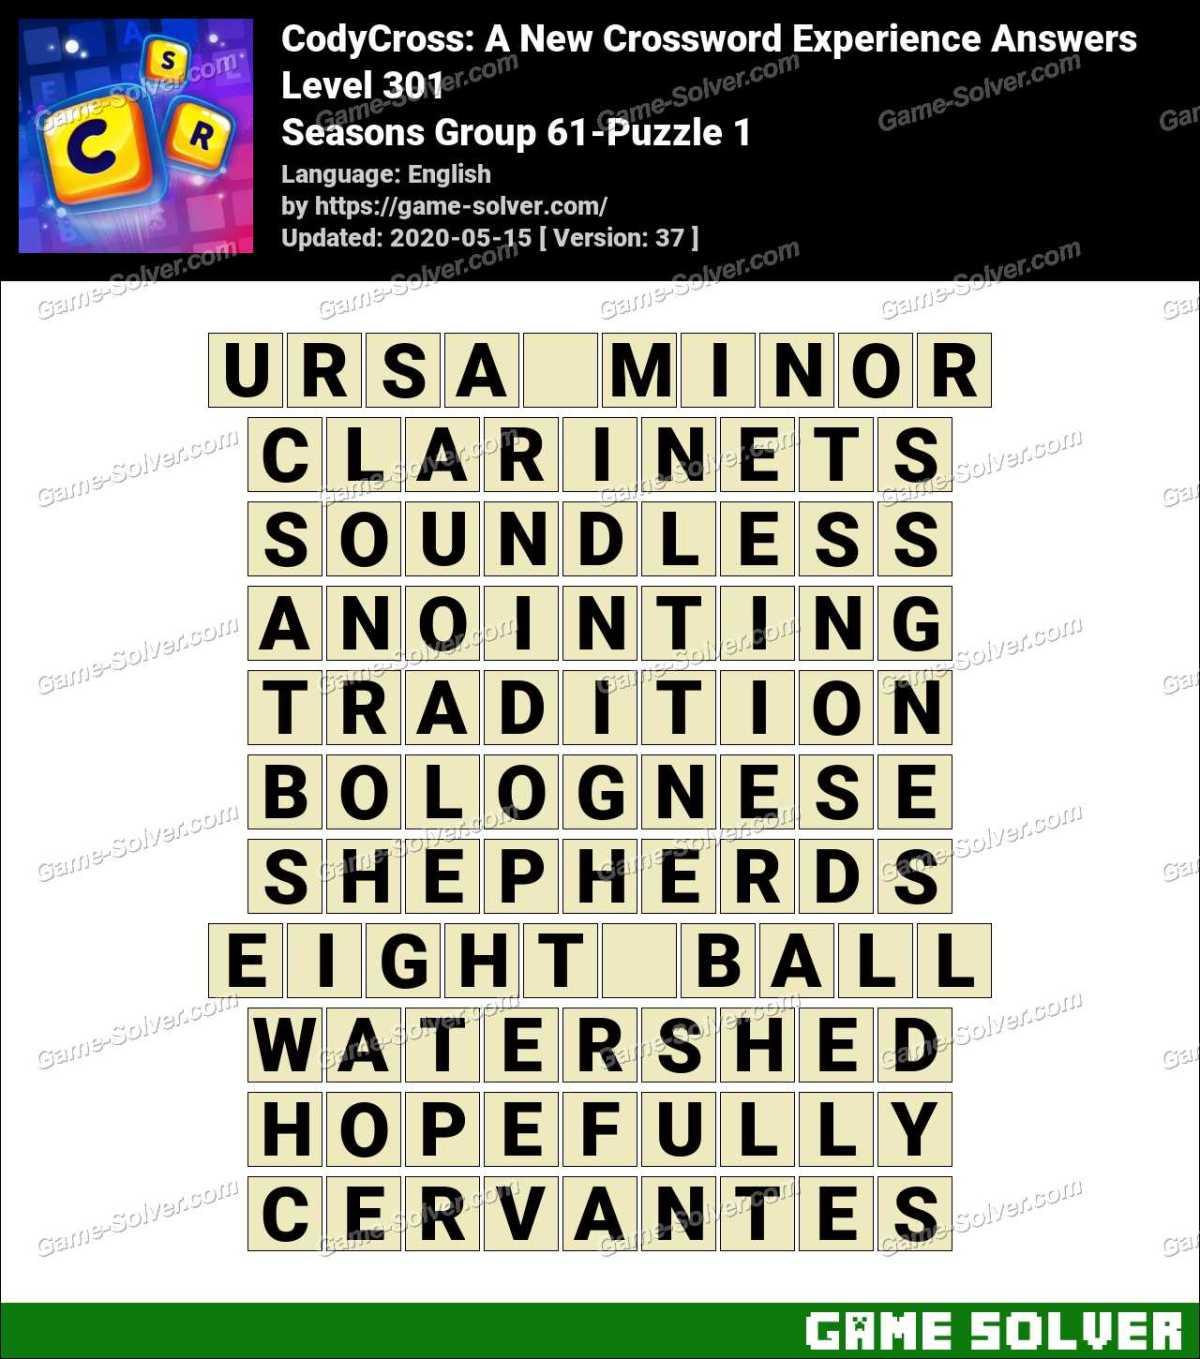 CodyCross Seasons Group 61-Puzzle 1 Answers